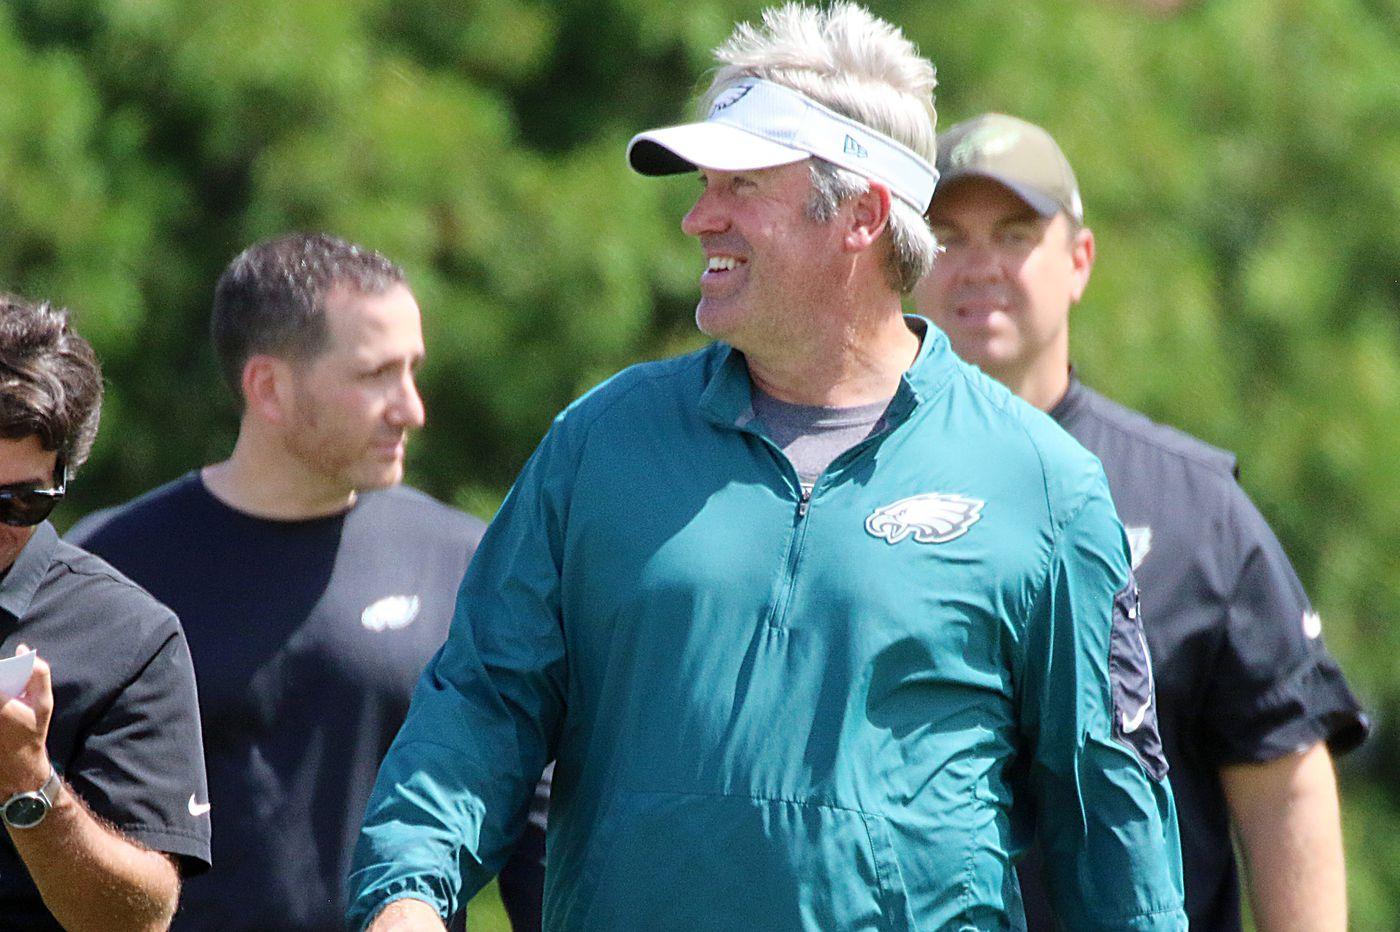 Eagles practice observations: Jake Elliott shortens the day; Darren Sproles/Nelson Agholor handling kick returns